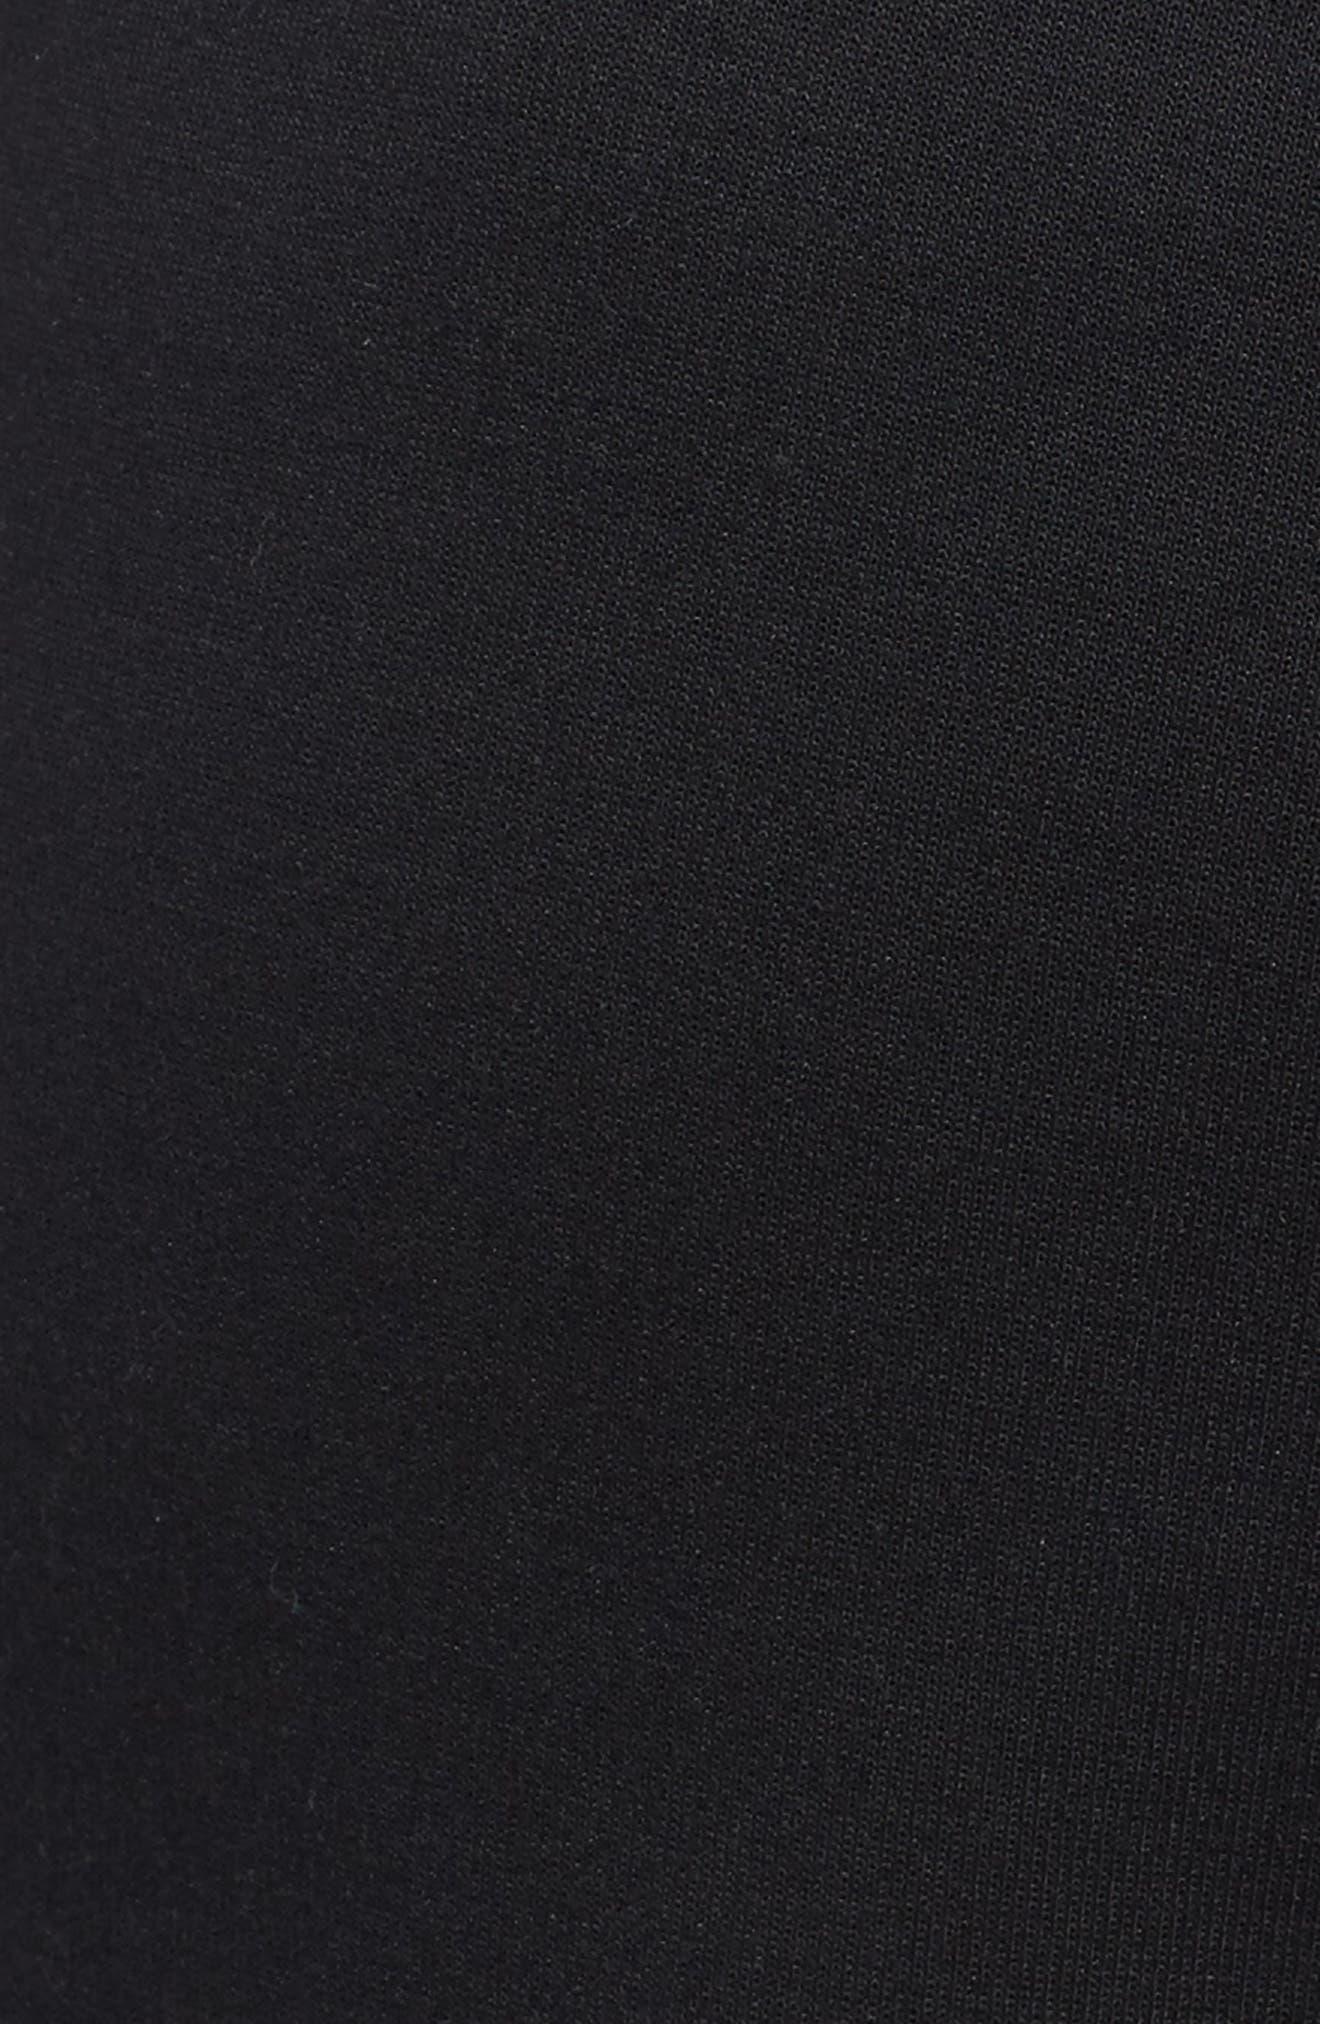 TS Knit Shorts,                             Alternate thumbnail 5, color,                             005